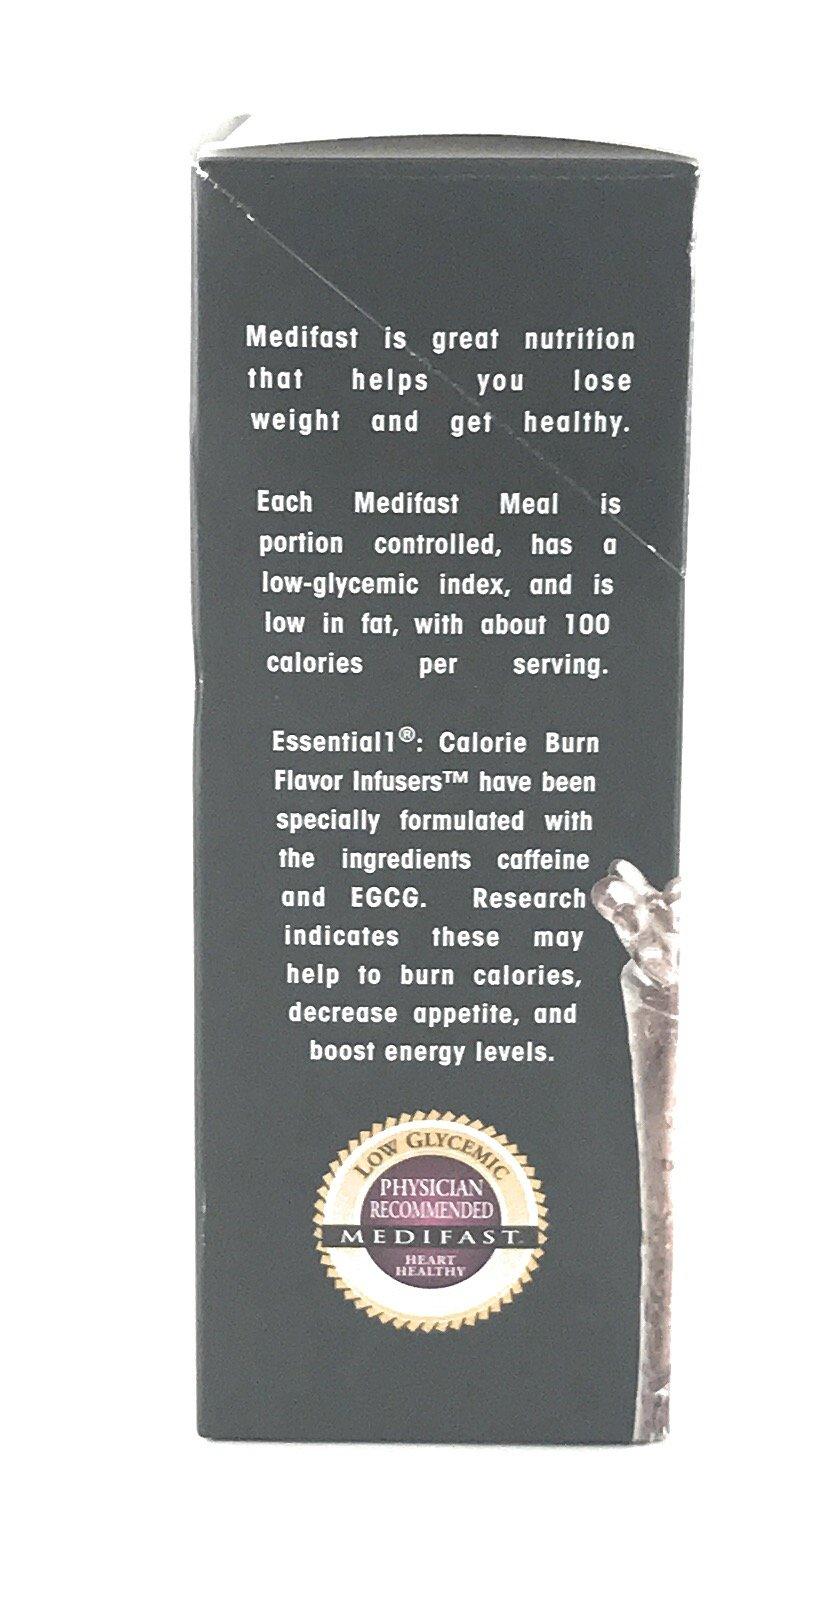 Medifast Essential1: Calorie Burn Strawberry Lemonade Flavor Infuser (1 Box/21 Servings) by Medifast (Image #4)